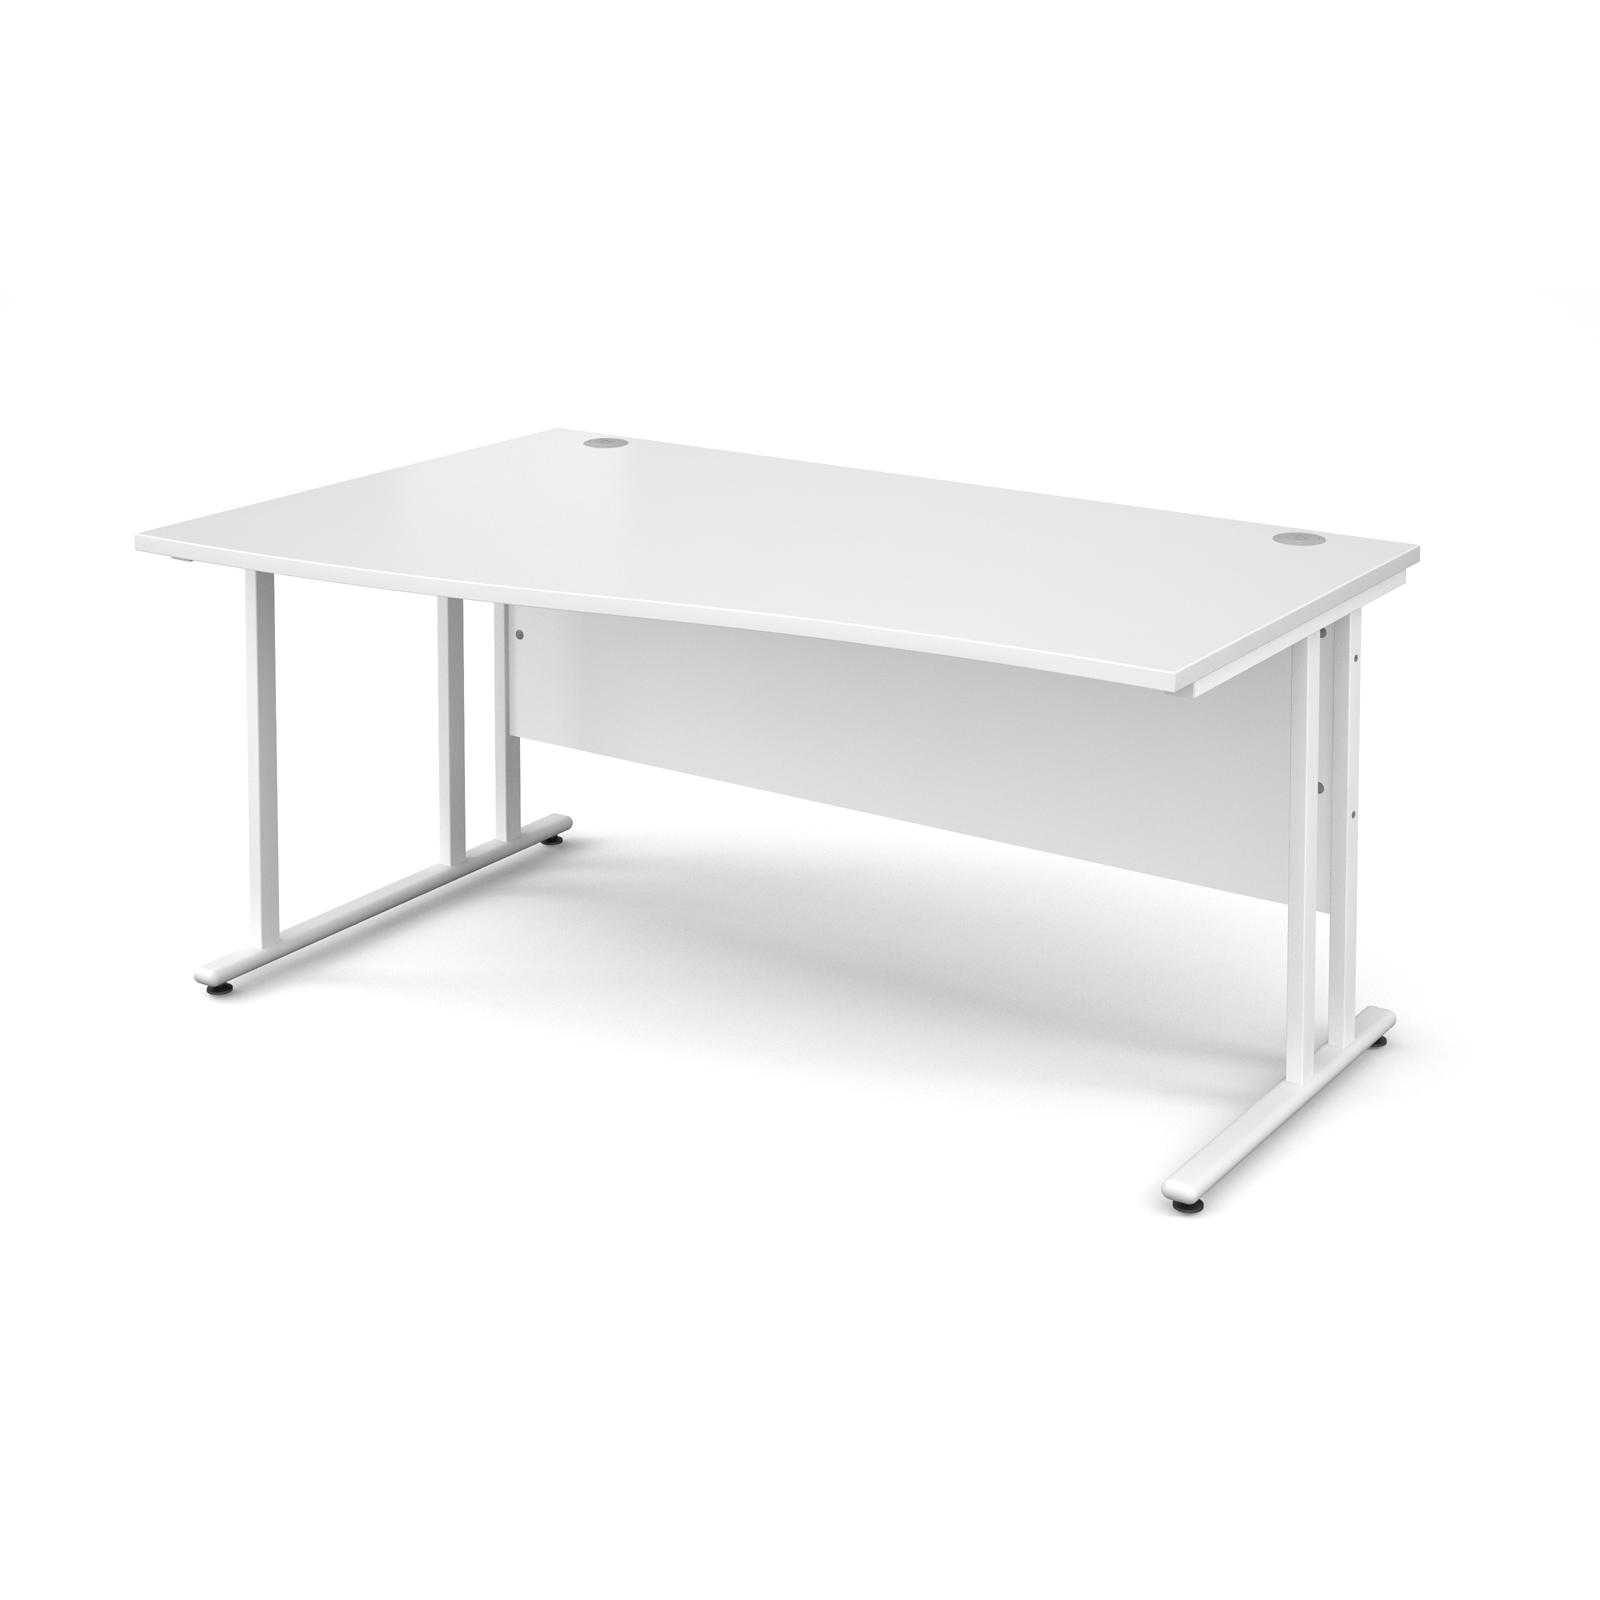 Maestro 25 Wl Left Hand Wave Desk 1600mm - White Cantilever Frame, White Top